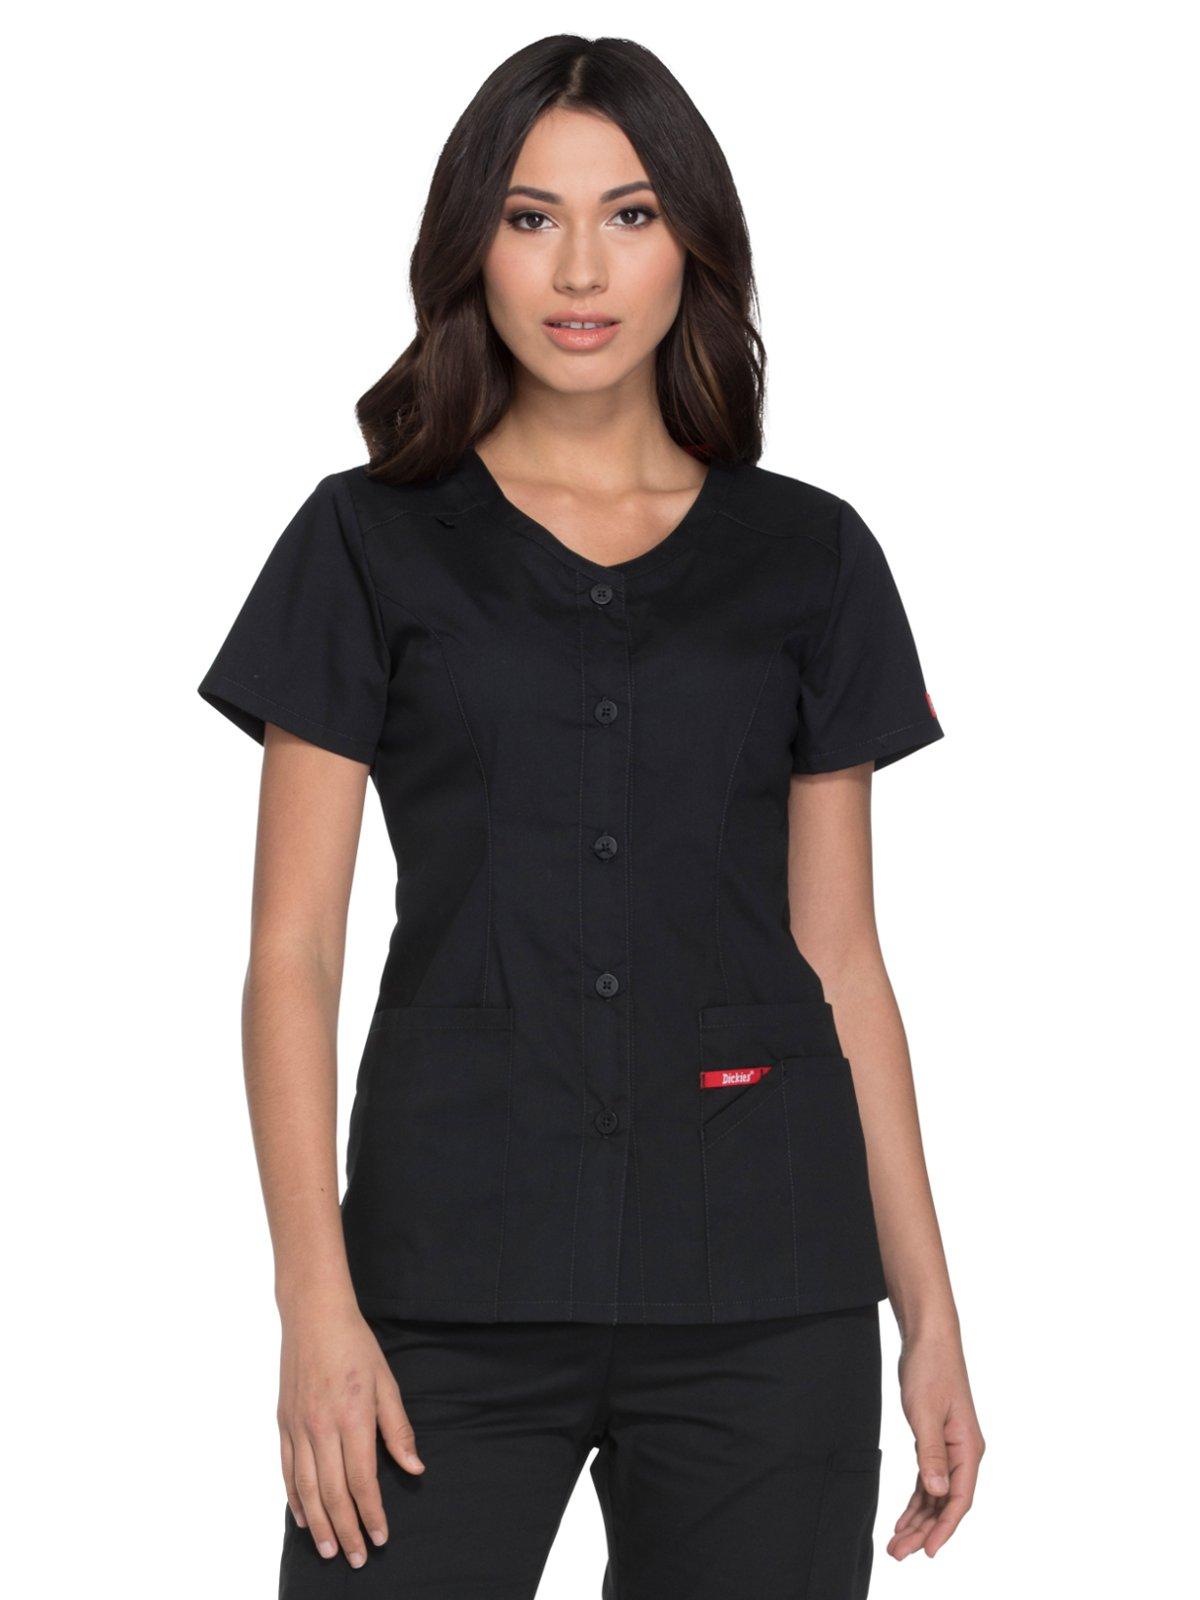 Dickies EDS Signature Women's V-Neck Solid Scrub Top Medium Black